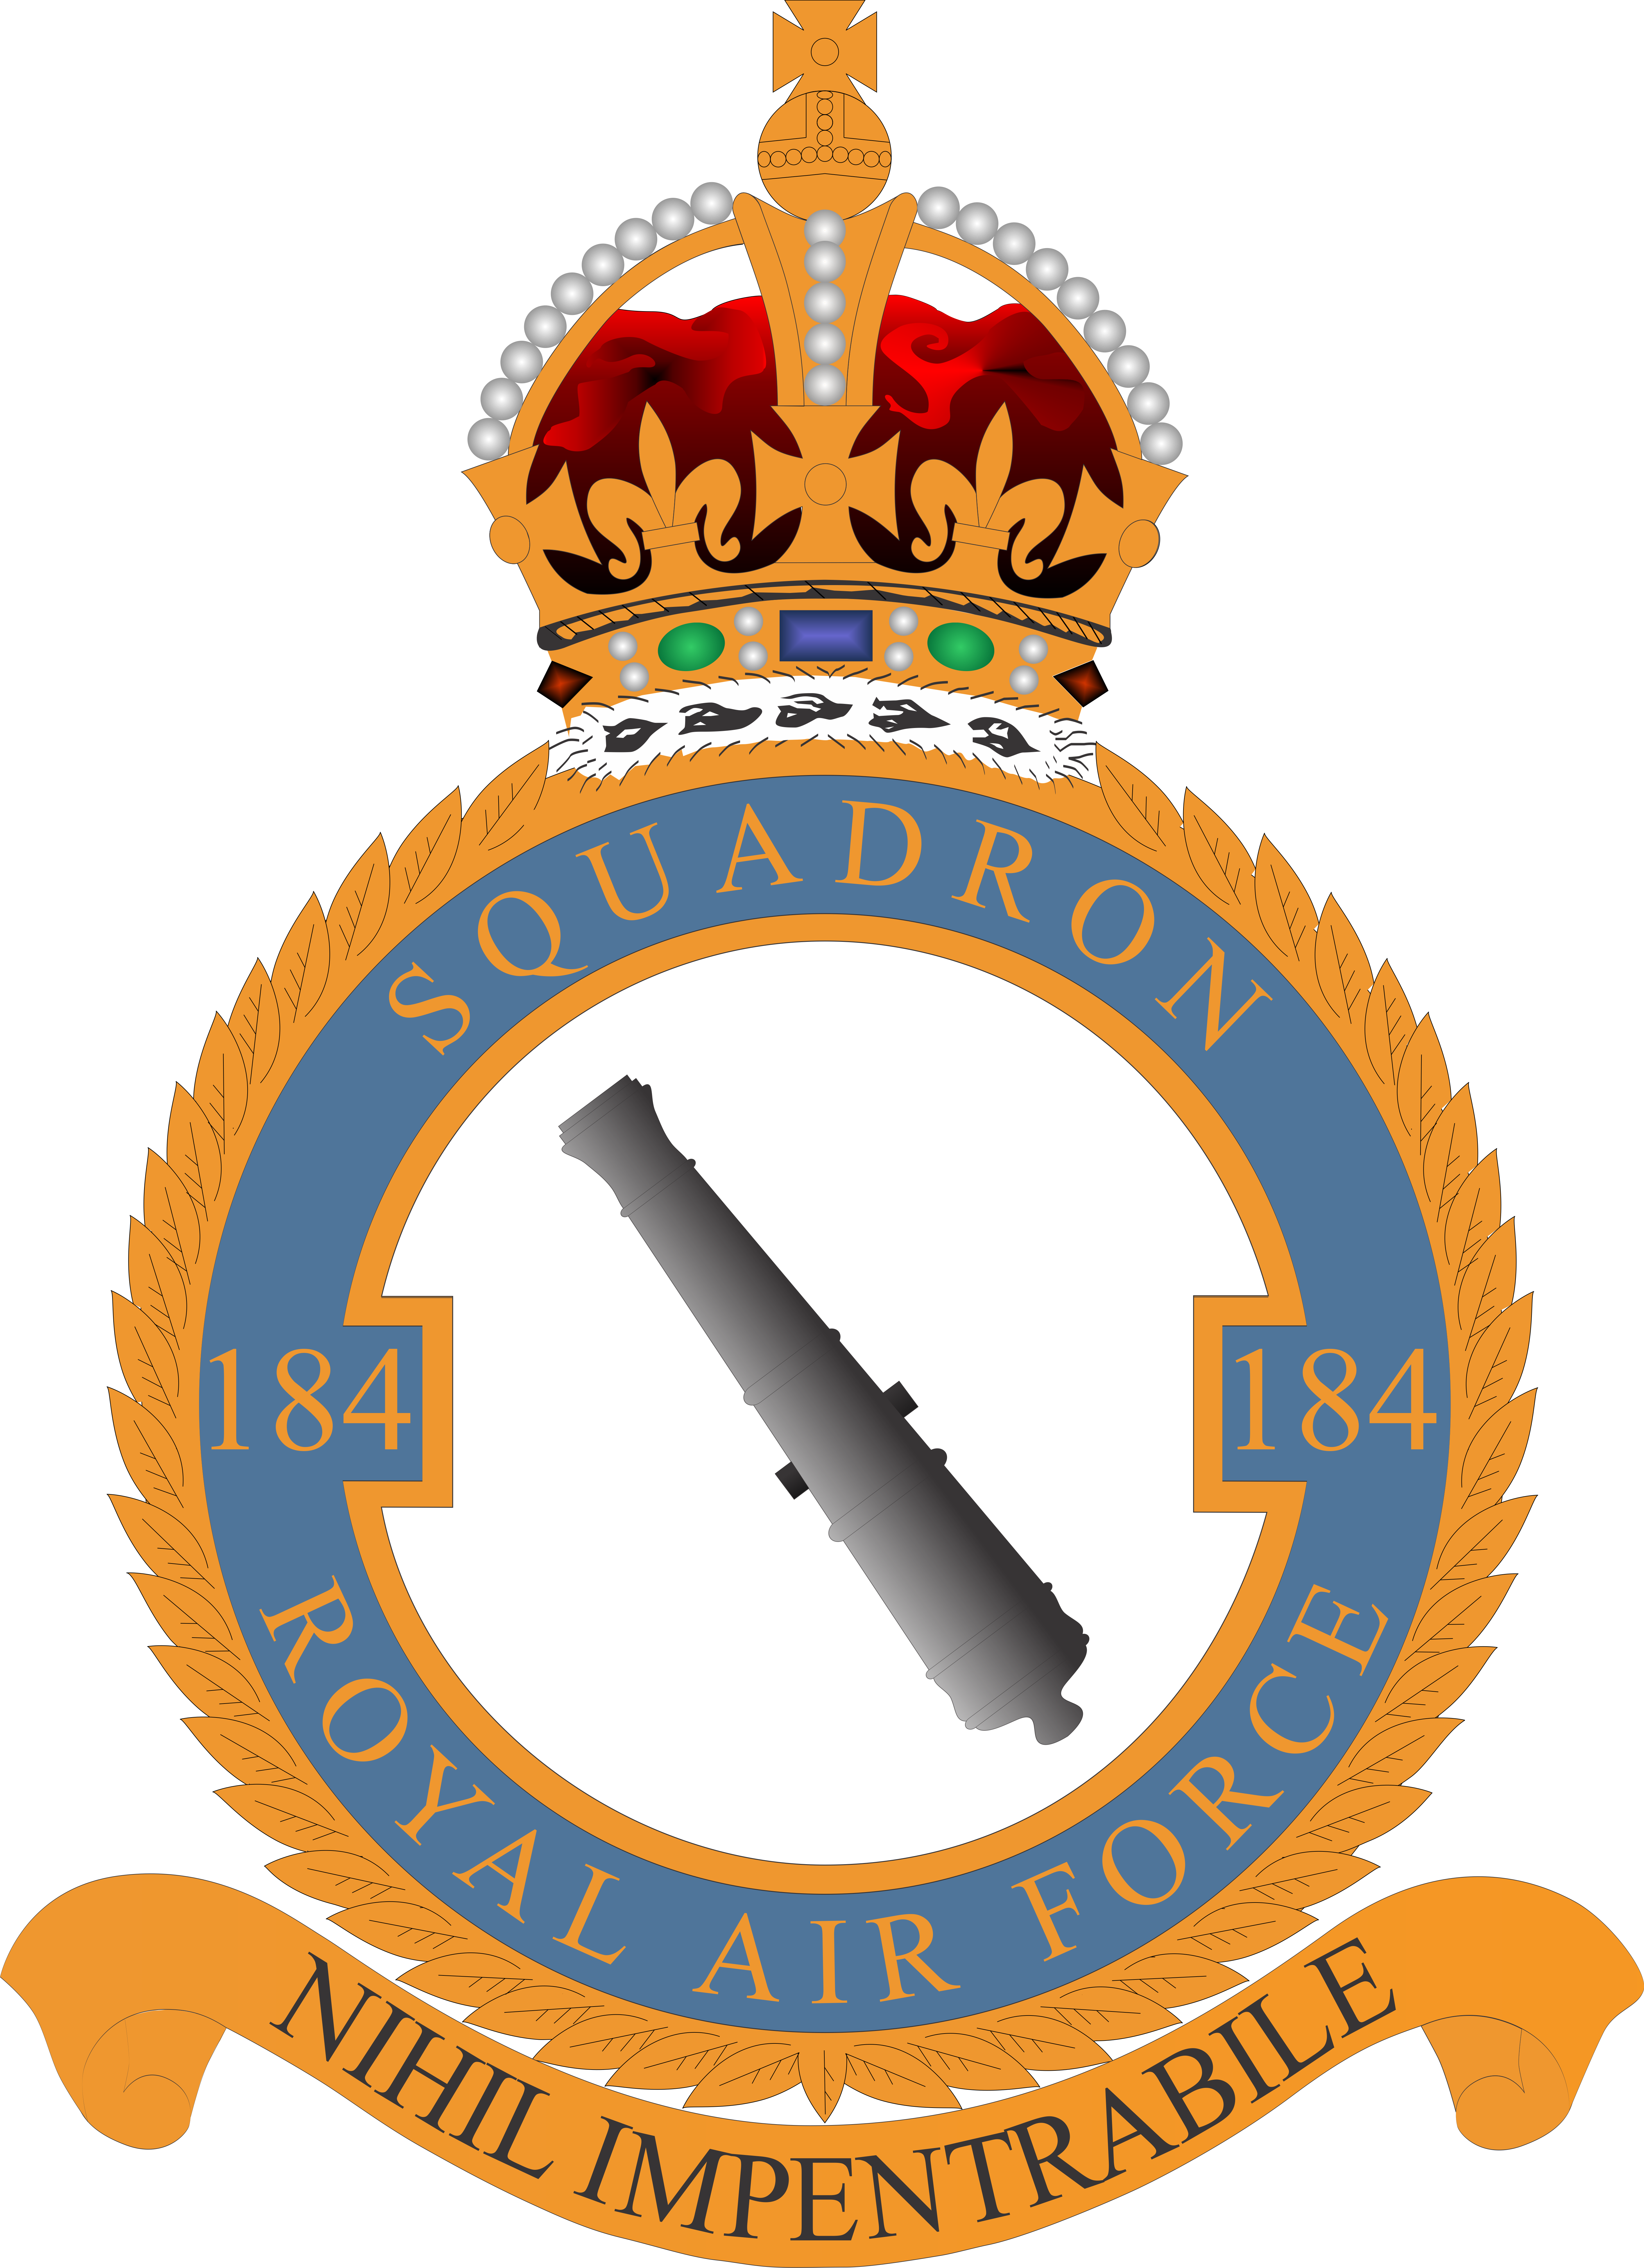 184 Squadron RAF - Wikipedia